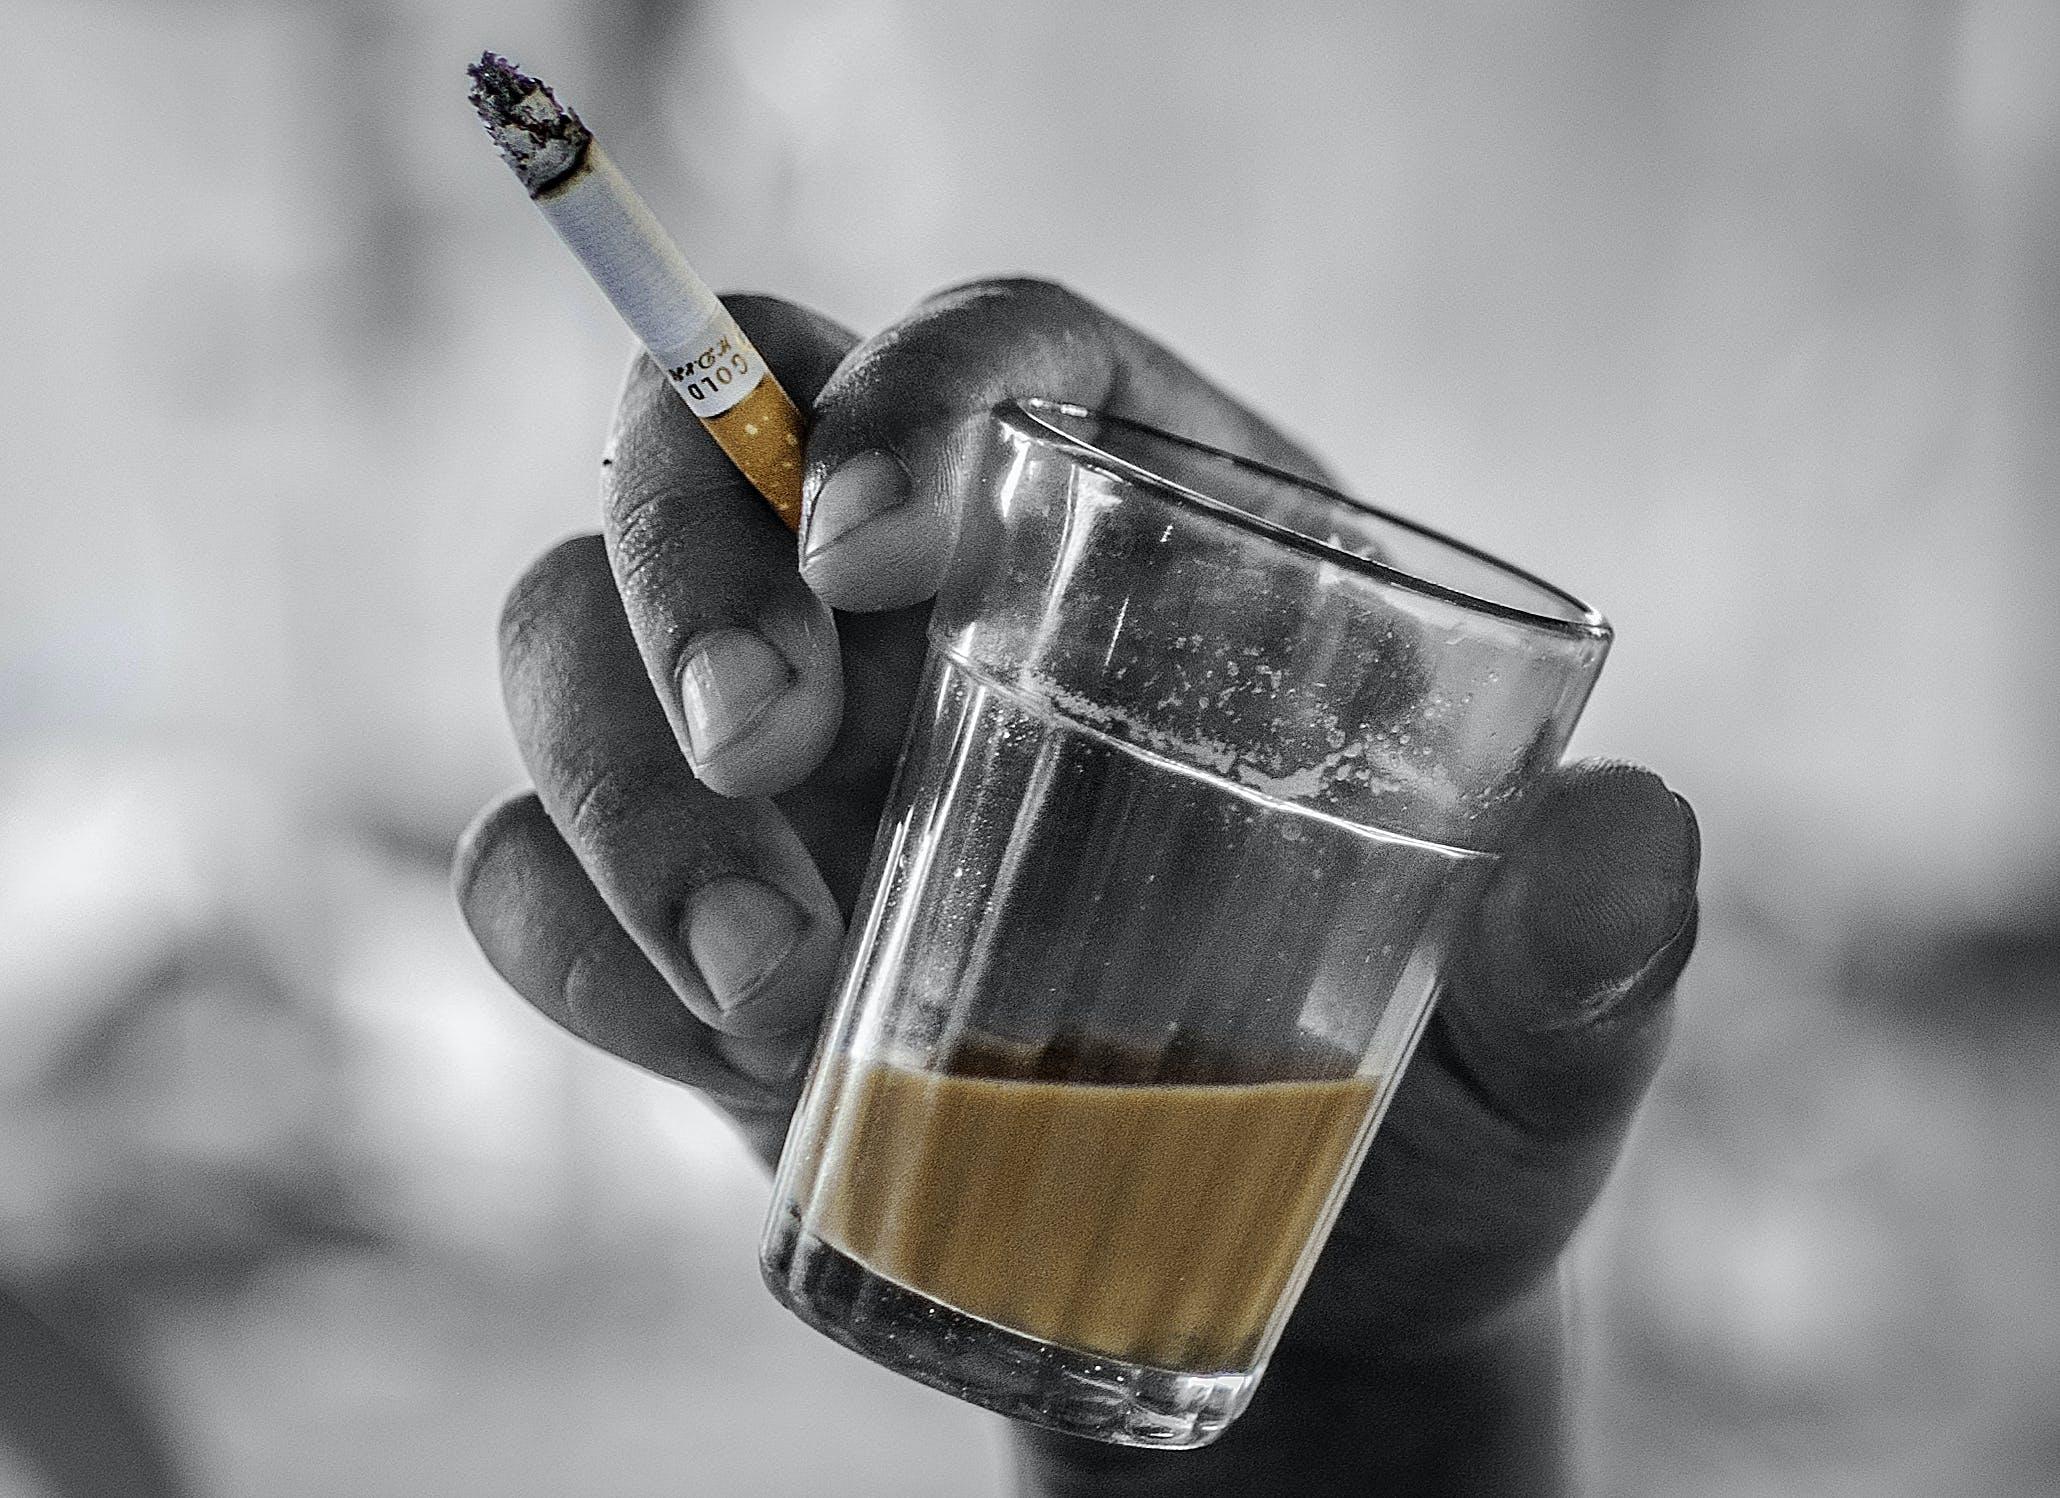 Free stock photo of chai, cigarette, colour pop, cup